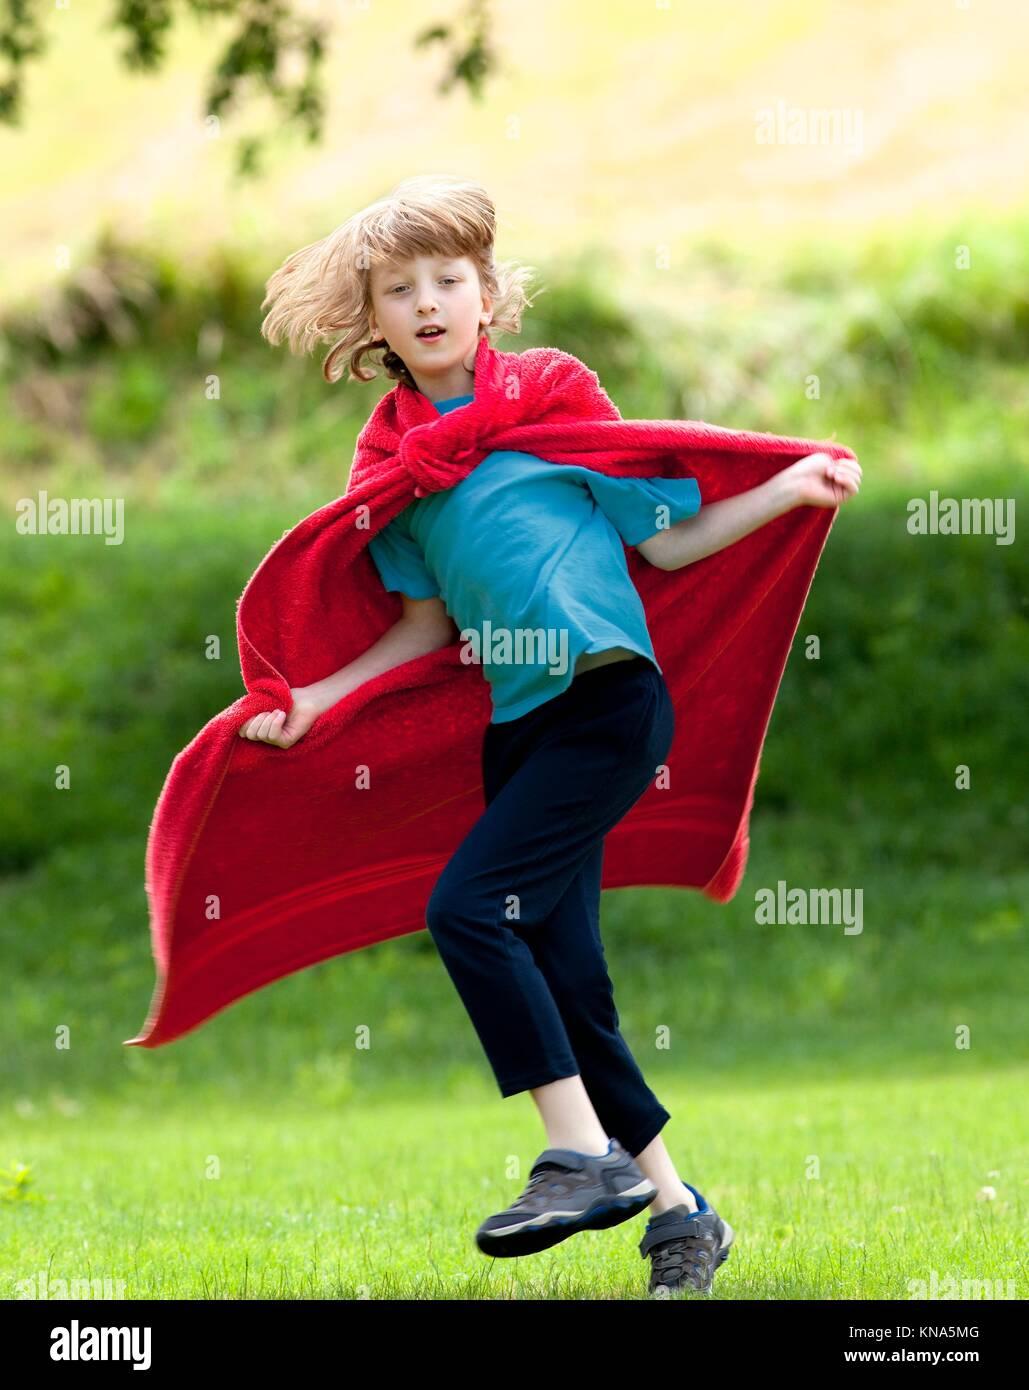 Boy Running Around in Red Towel as Superhero Cloak. - Stock Image